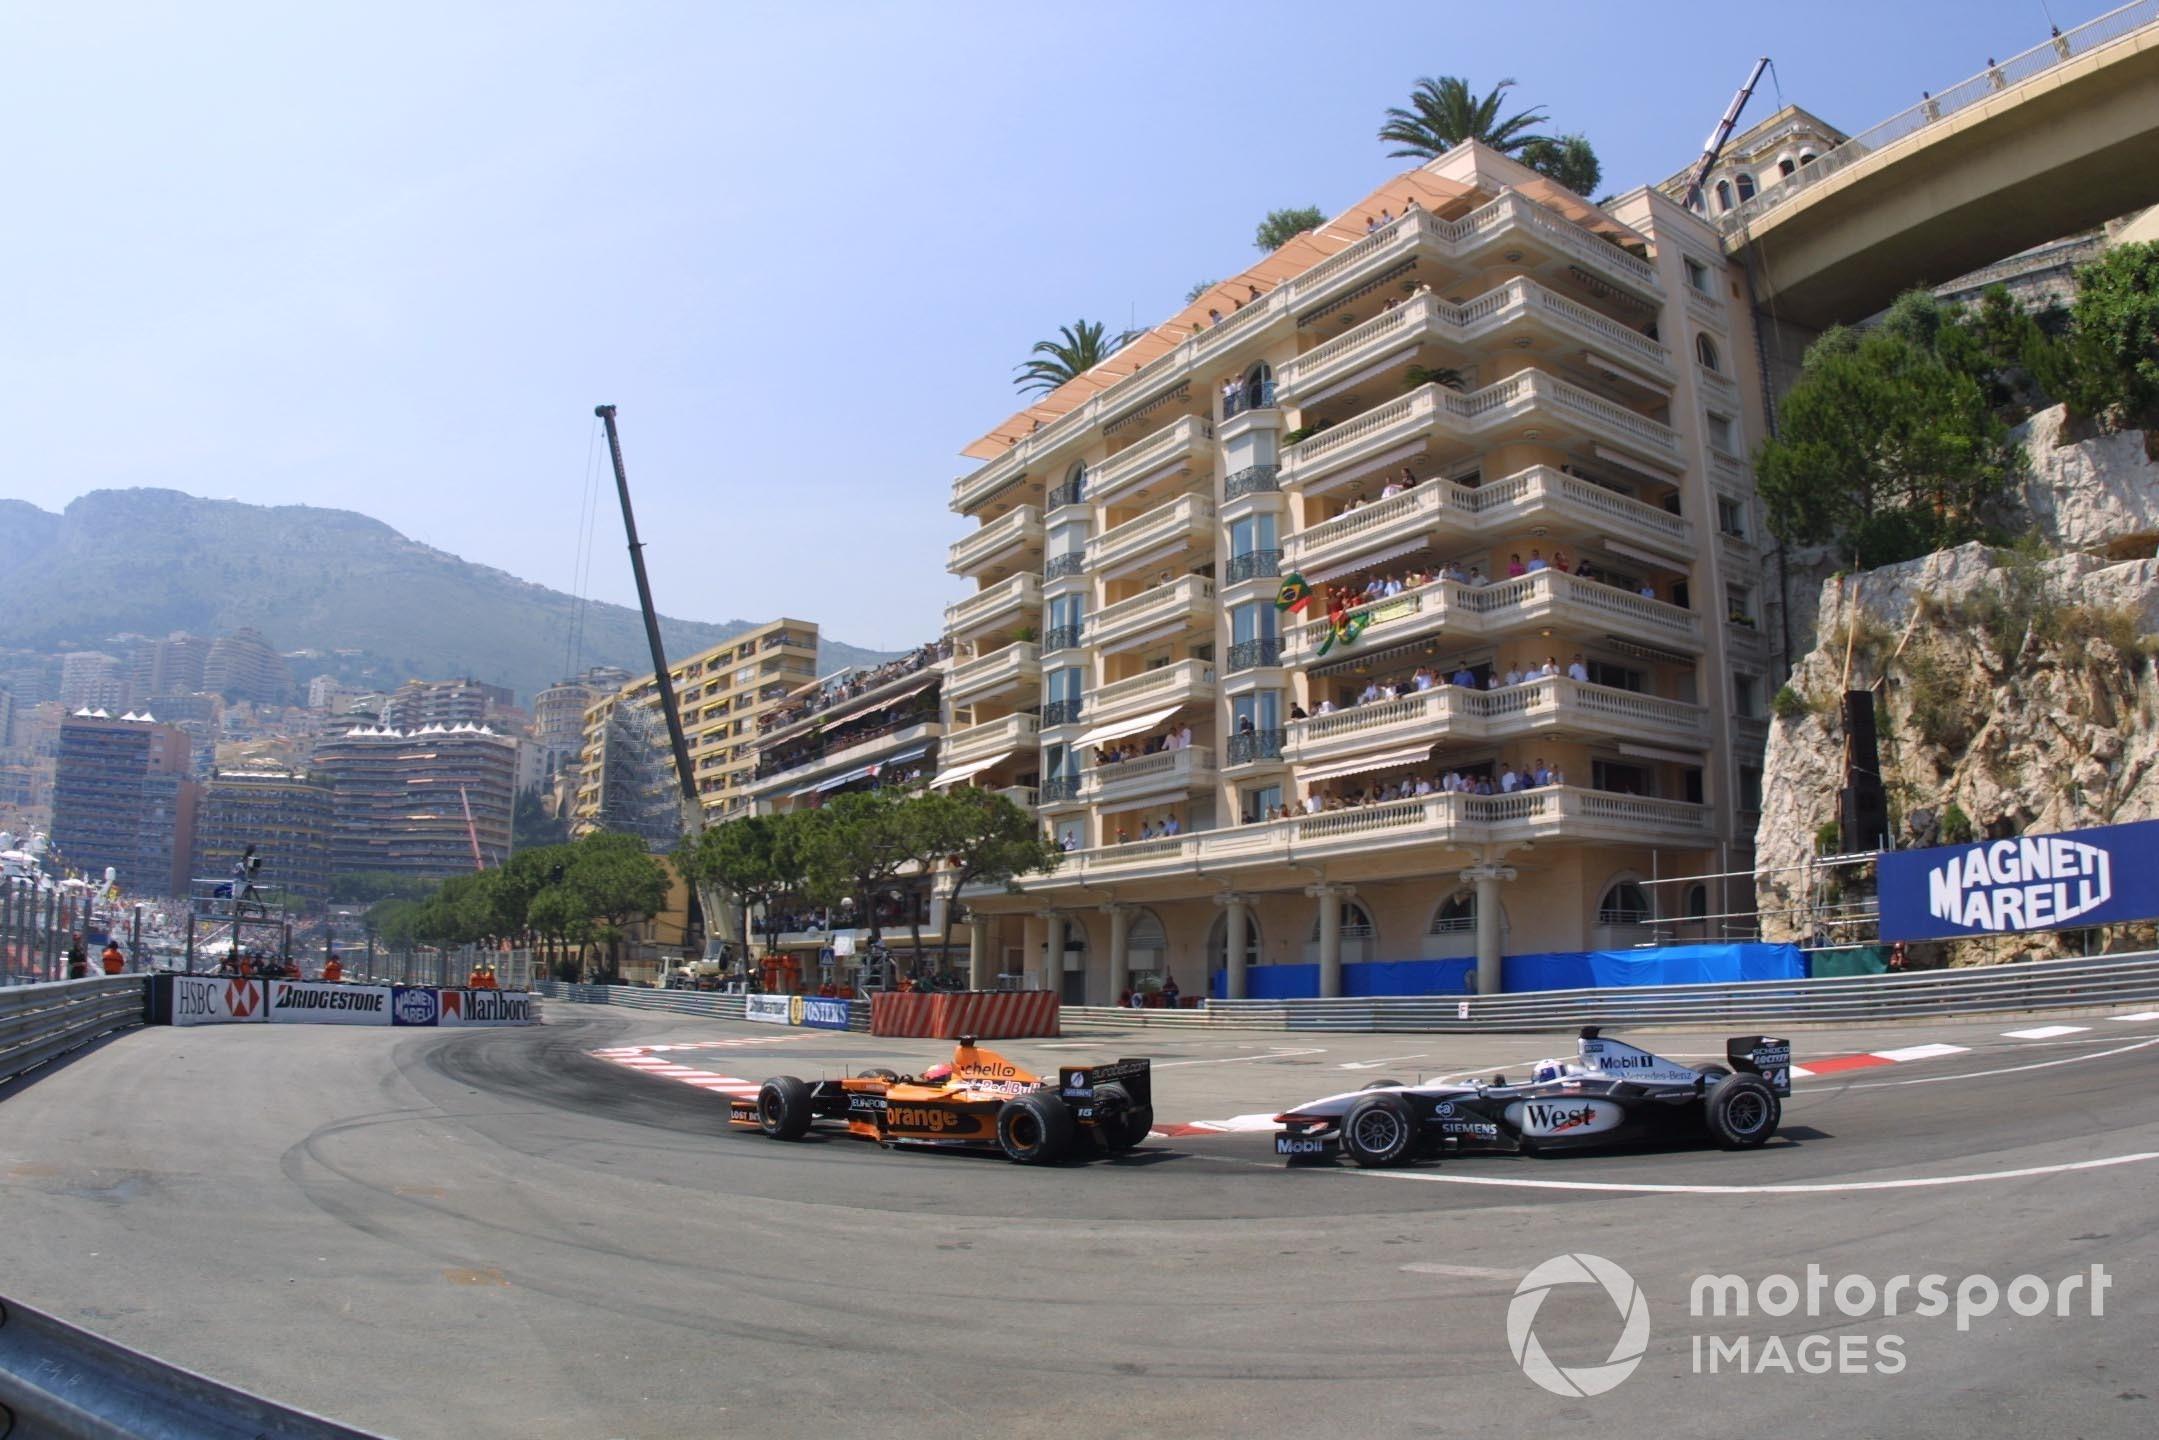 Enrique Bernoldi (Arrows A22 Asiatech) followed by David Coulthard (McLaren MP4/16 Mercedes), 2001 Monaco GP